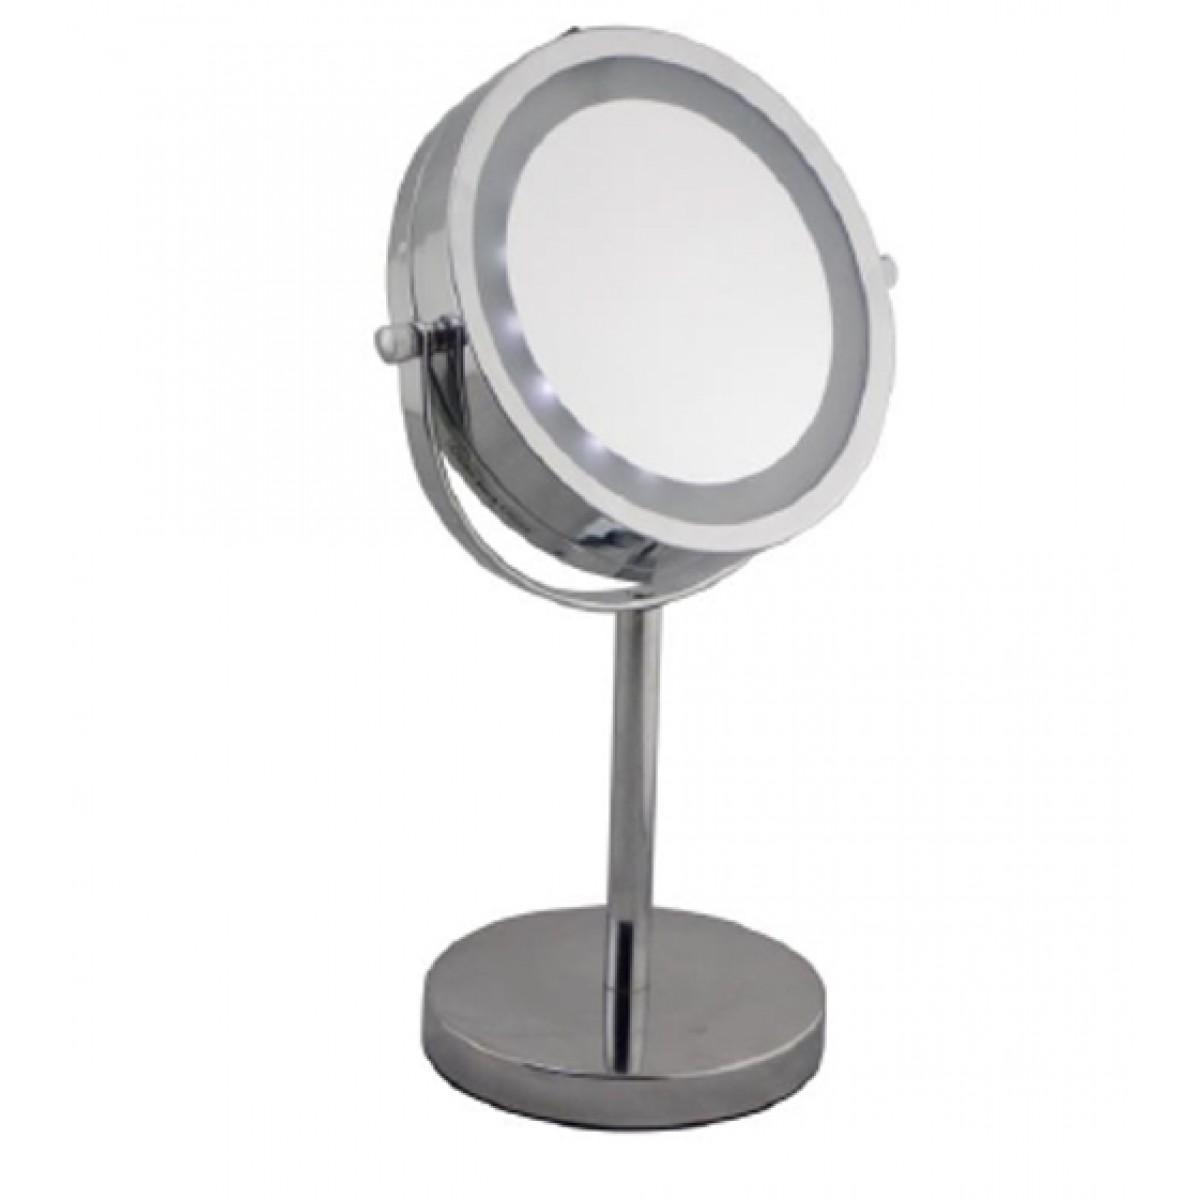 DA´CORE Bordspejl med lys